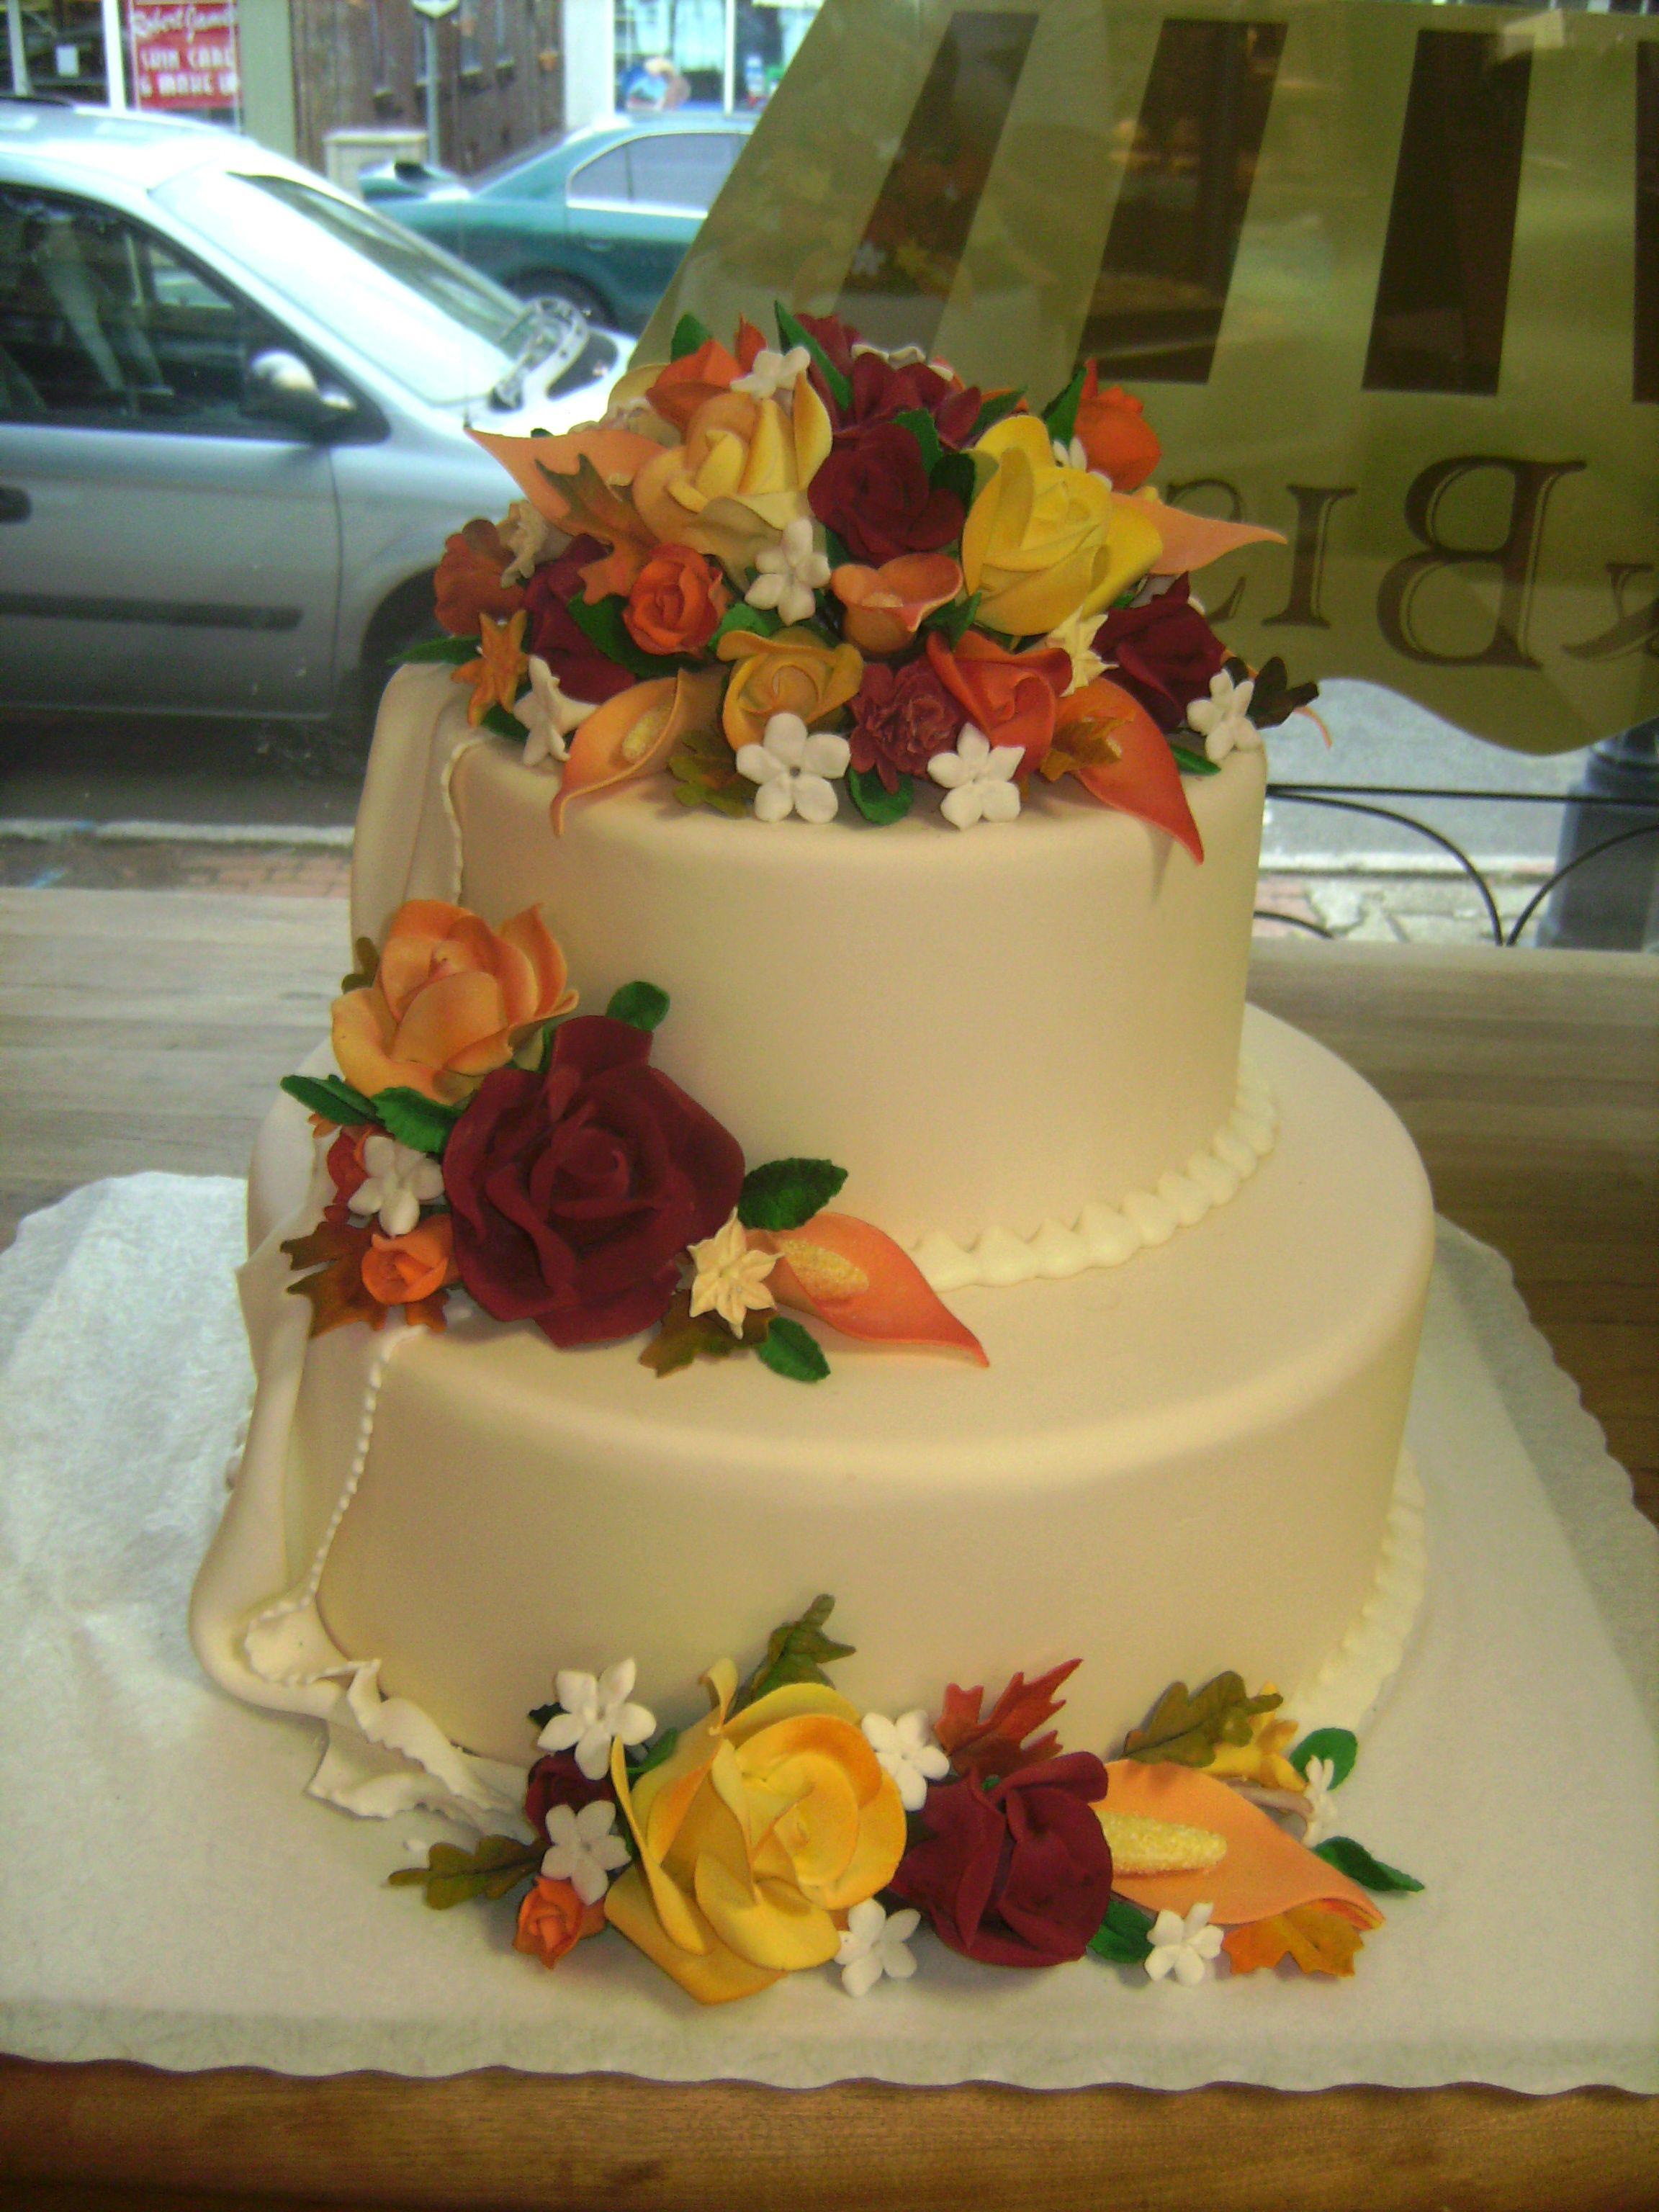 Festive autumn wedding cake | Wedding Cakes | Pinterest | Autumn ...